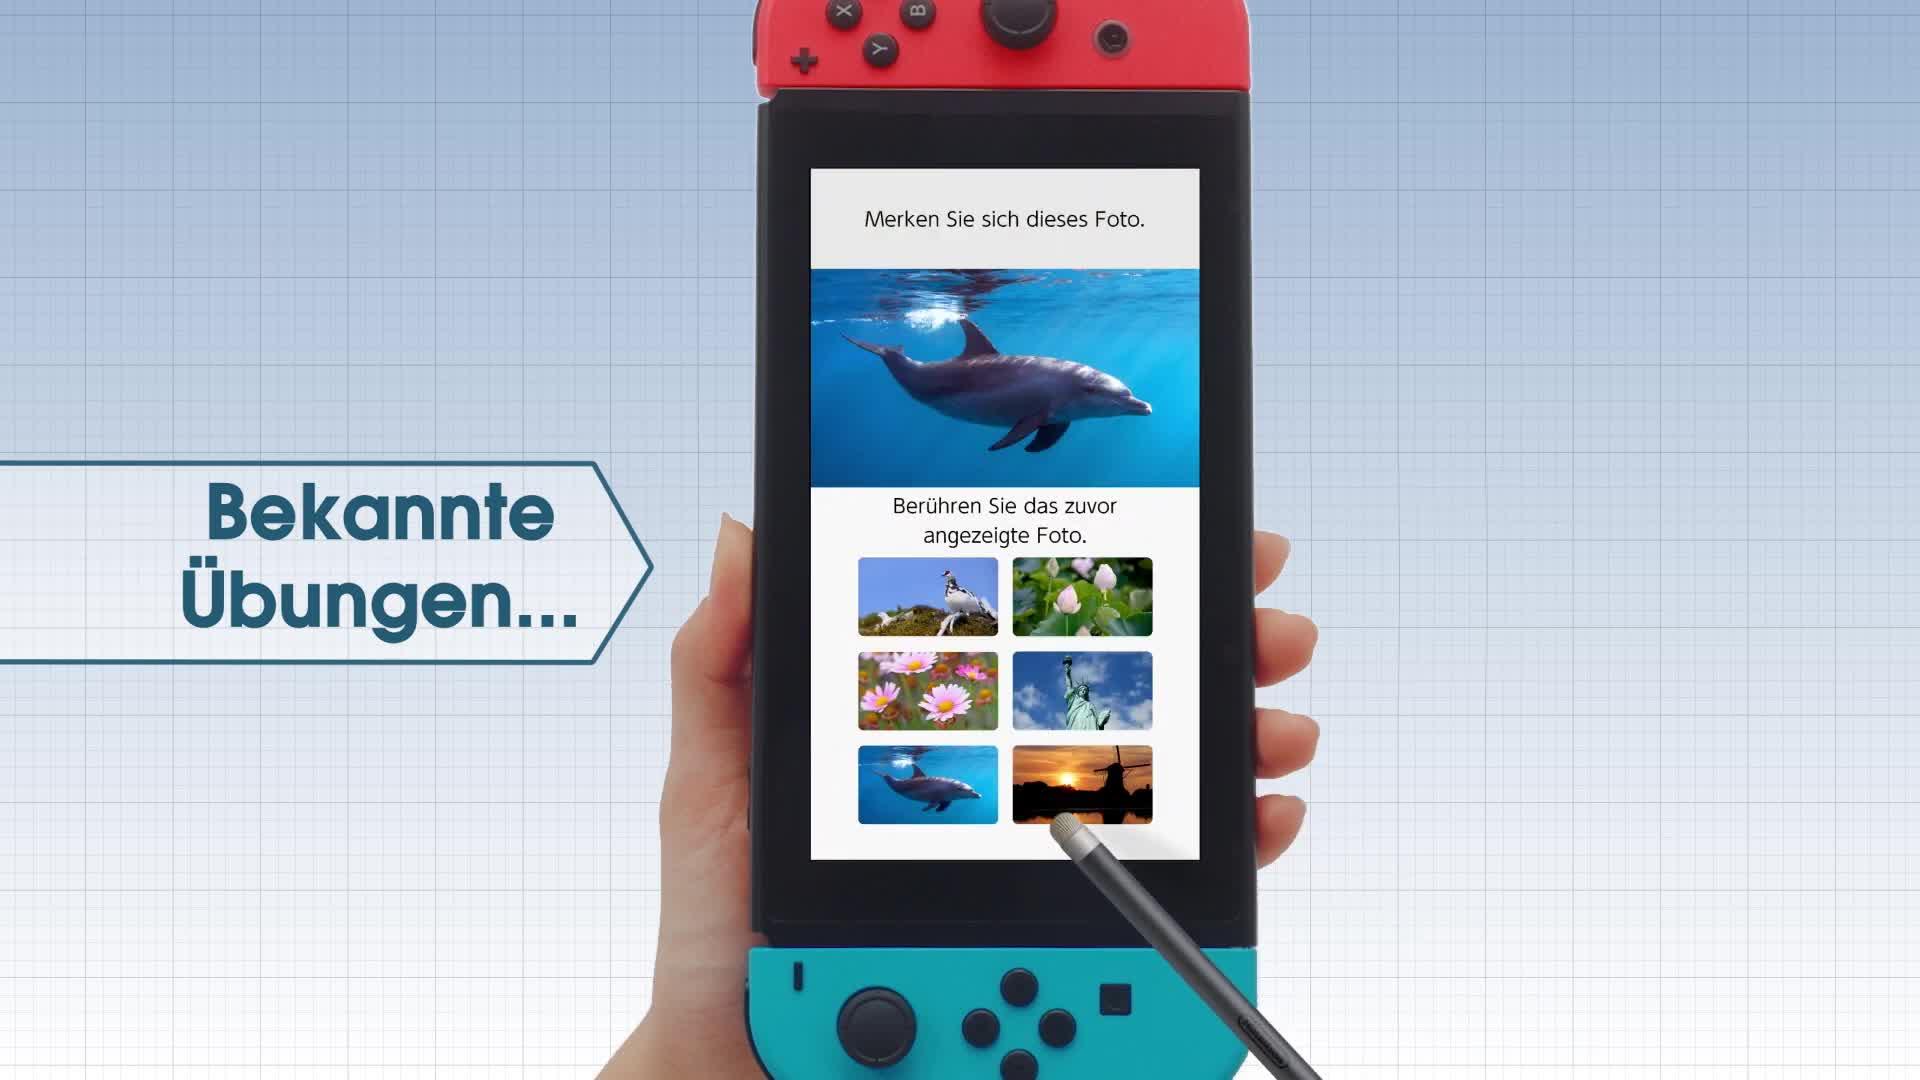 Trailer, Nintendo, Nintendo Switch, Switch, Dr. Kawashima, Dr. Kawashimas Gehirn-Jogging, Gehirn-Jogging